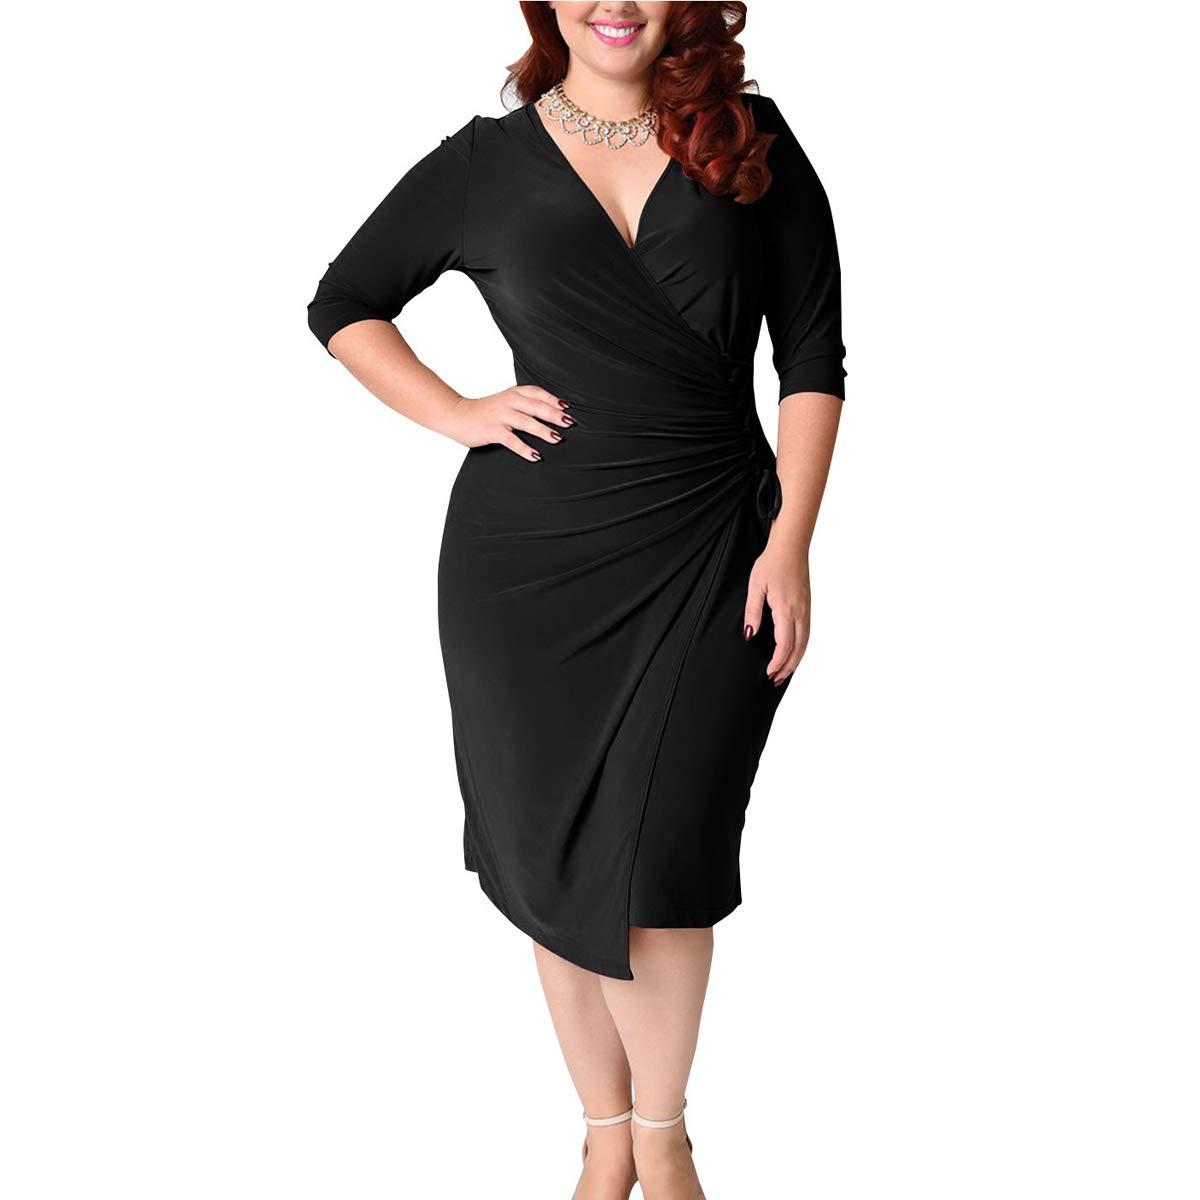 Fmeijia Plus Size Dresses, Fashion Sexy V-Neck Woman Party Elegant Bodycon Dress For Women L-5XL Black by Fmeijia